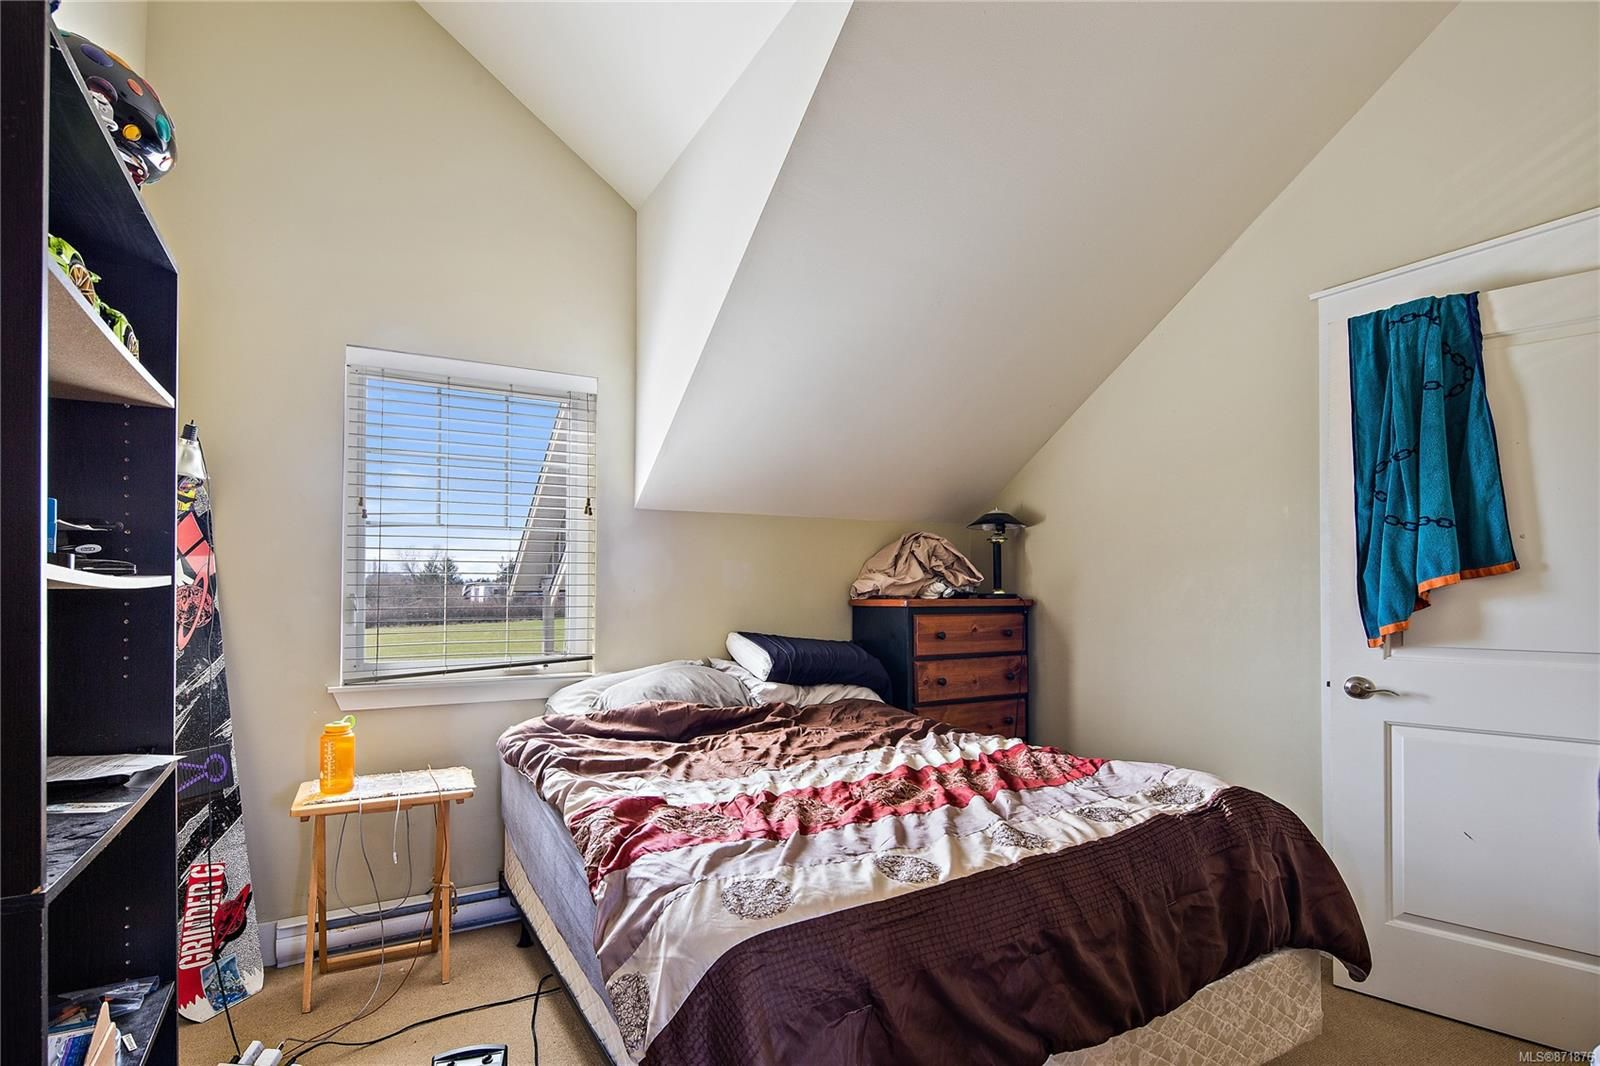 Photo 40: Photos: 4420 Wilkinson Rd in : SW Royal Oak House for sale (Saanich West)  : MLS®# 871876